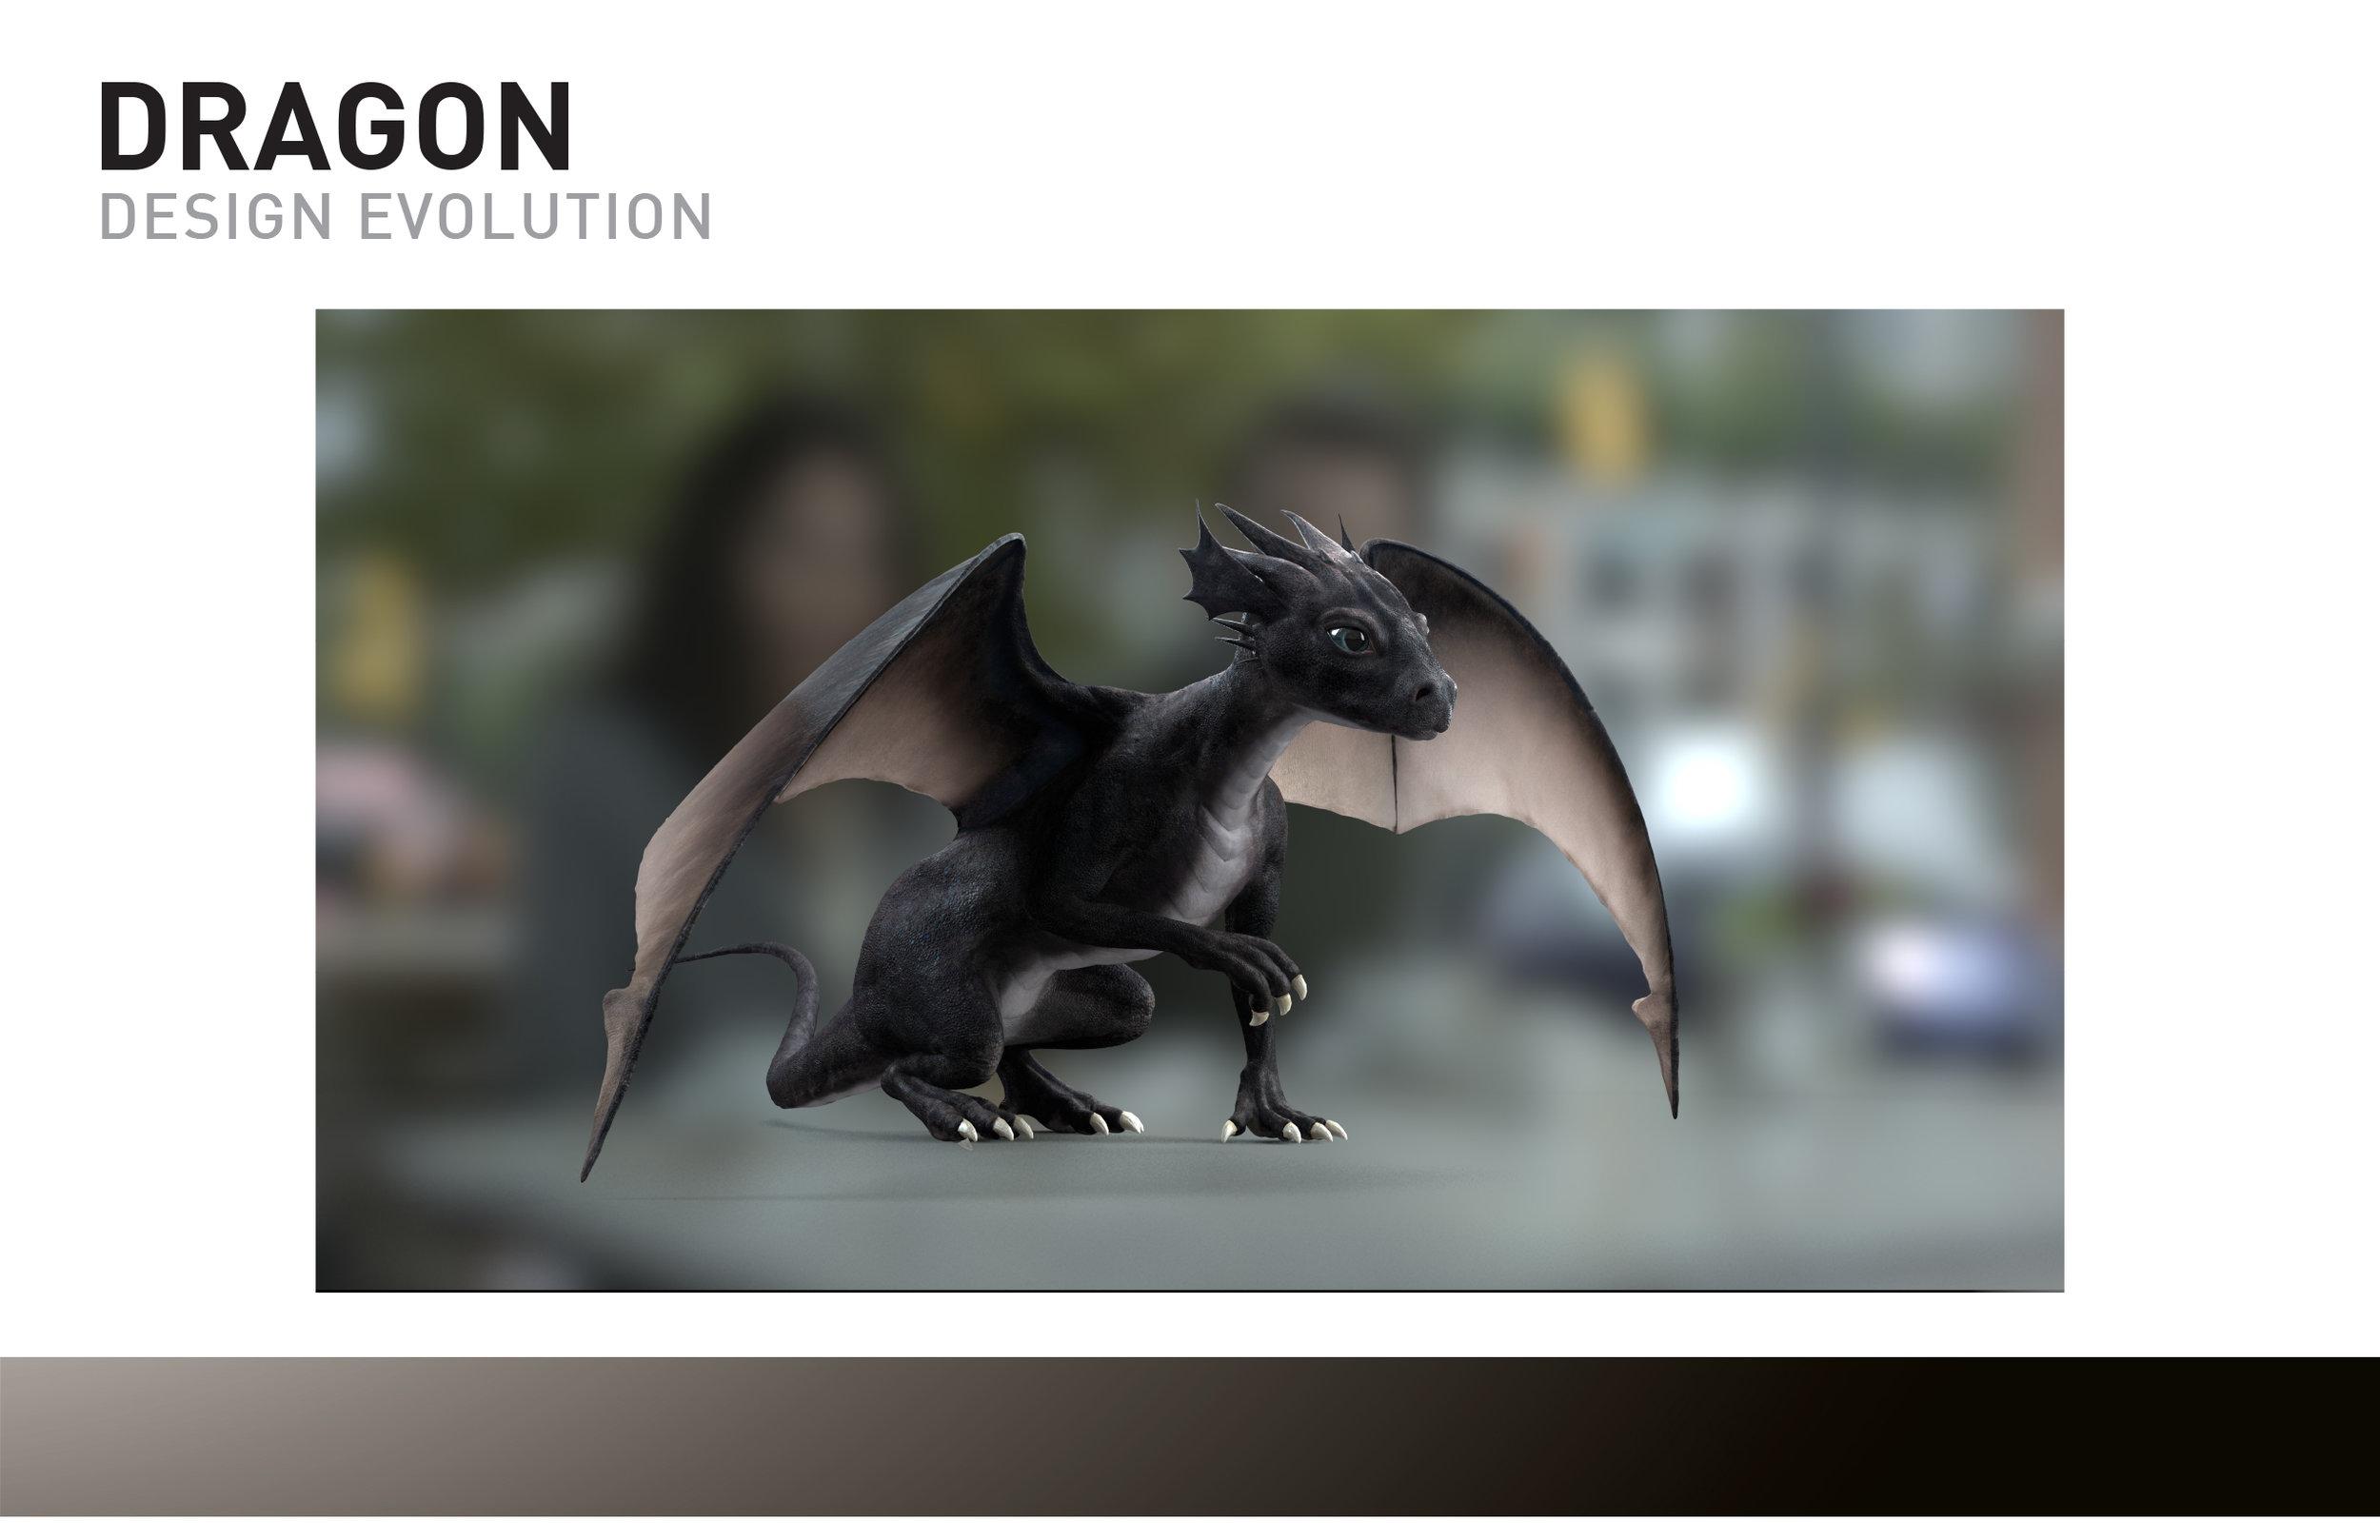 Dragon_Evolution11.14v2-5.jpg